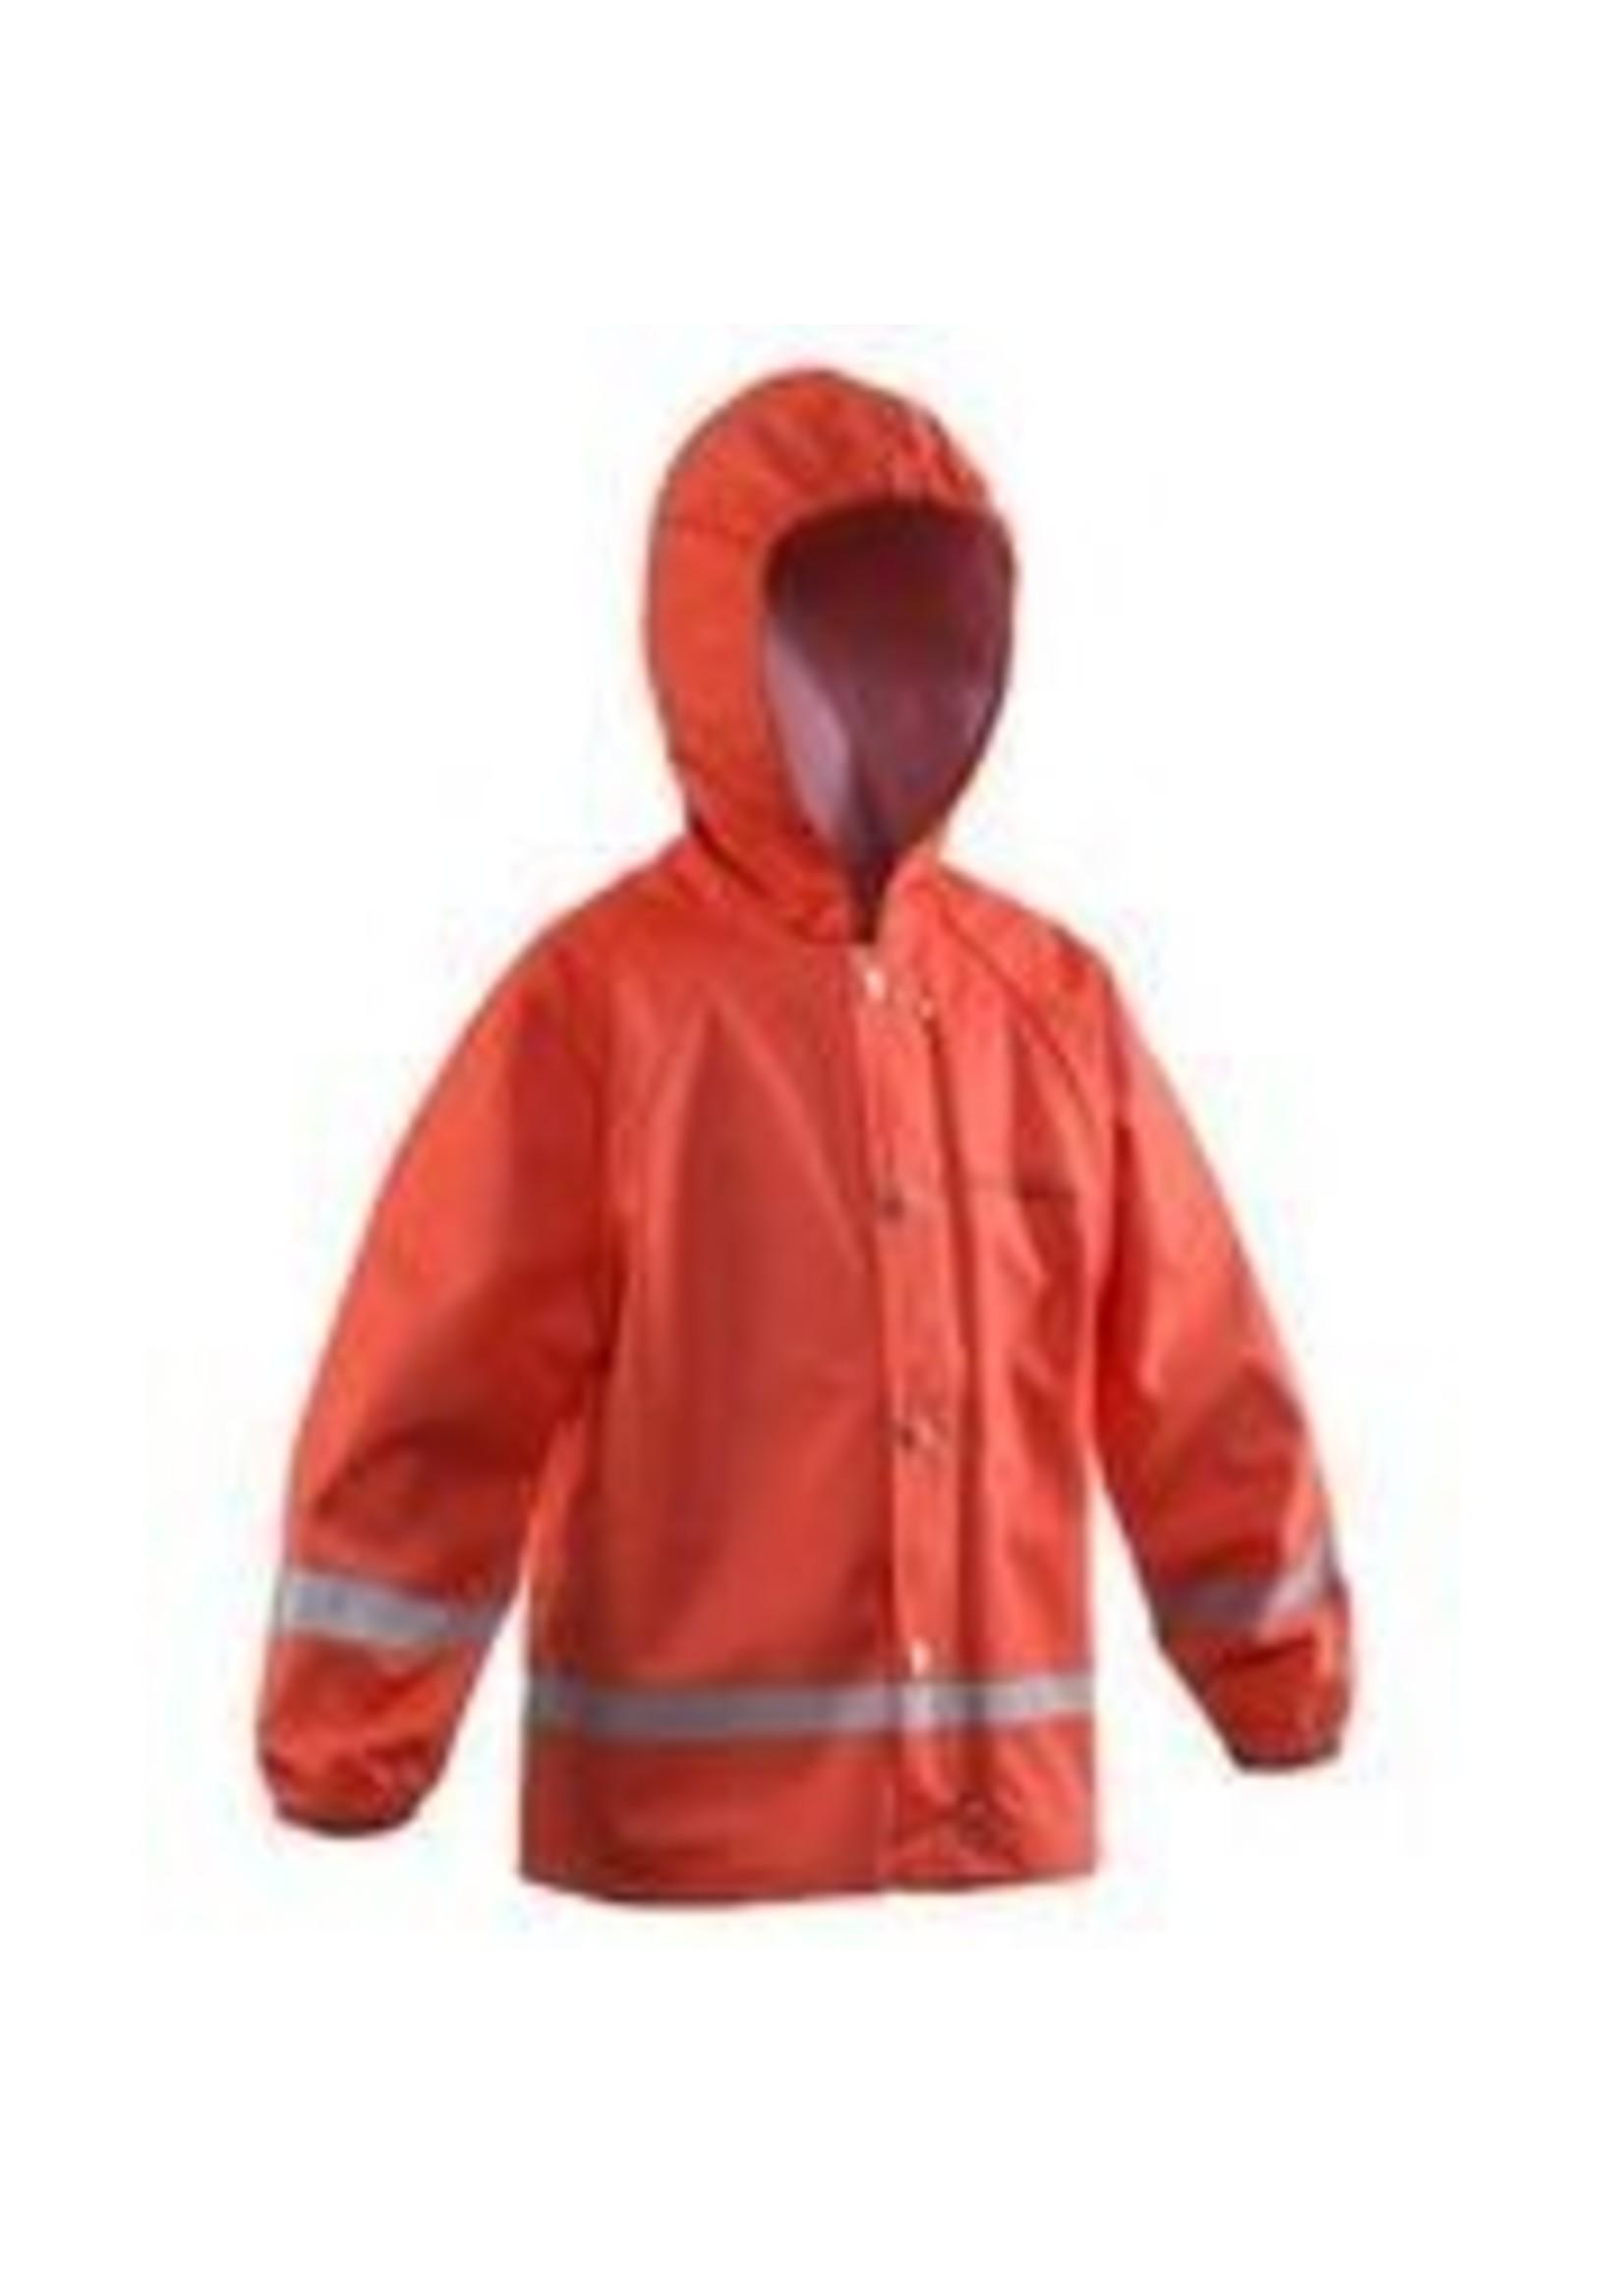 GRUNDENS USA, LTD. Grundens Child's Hooded Jacket